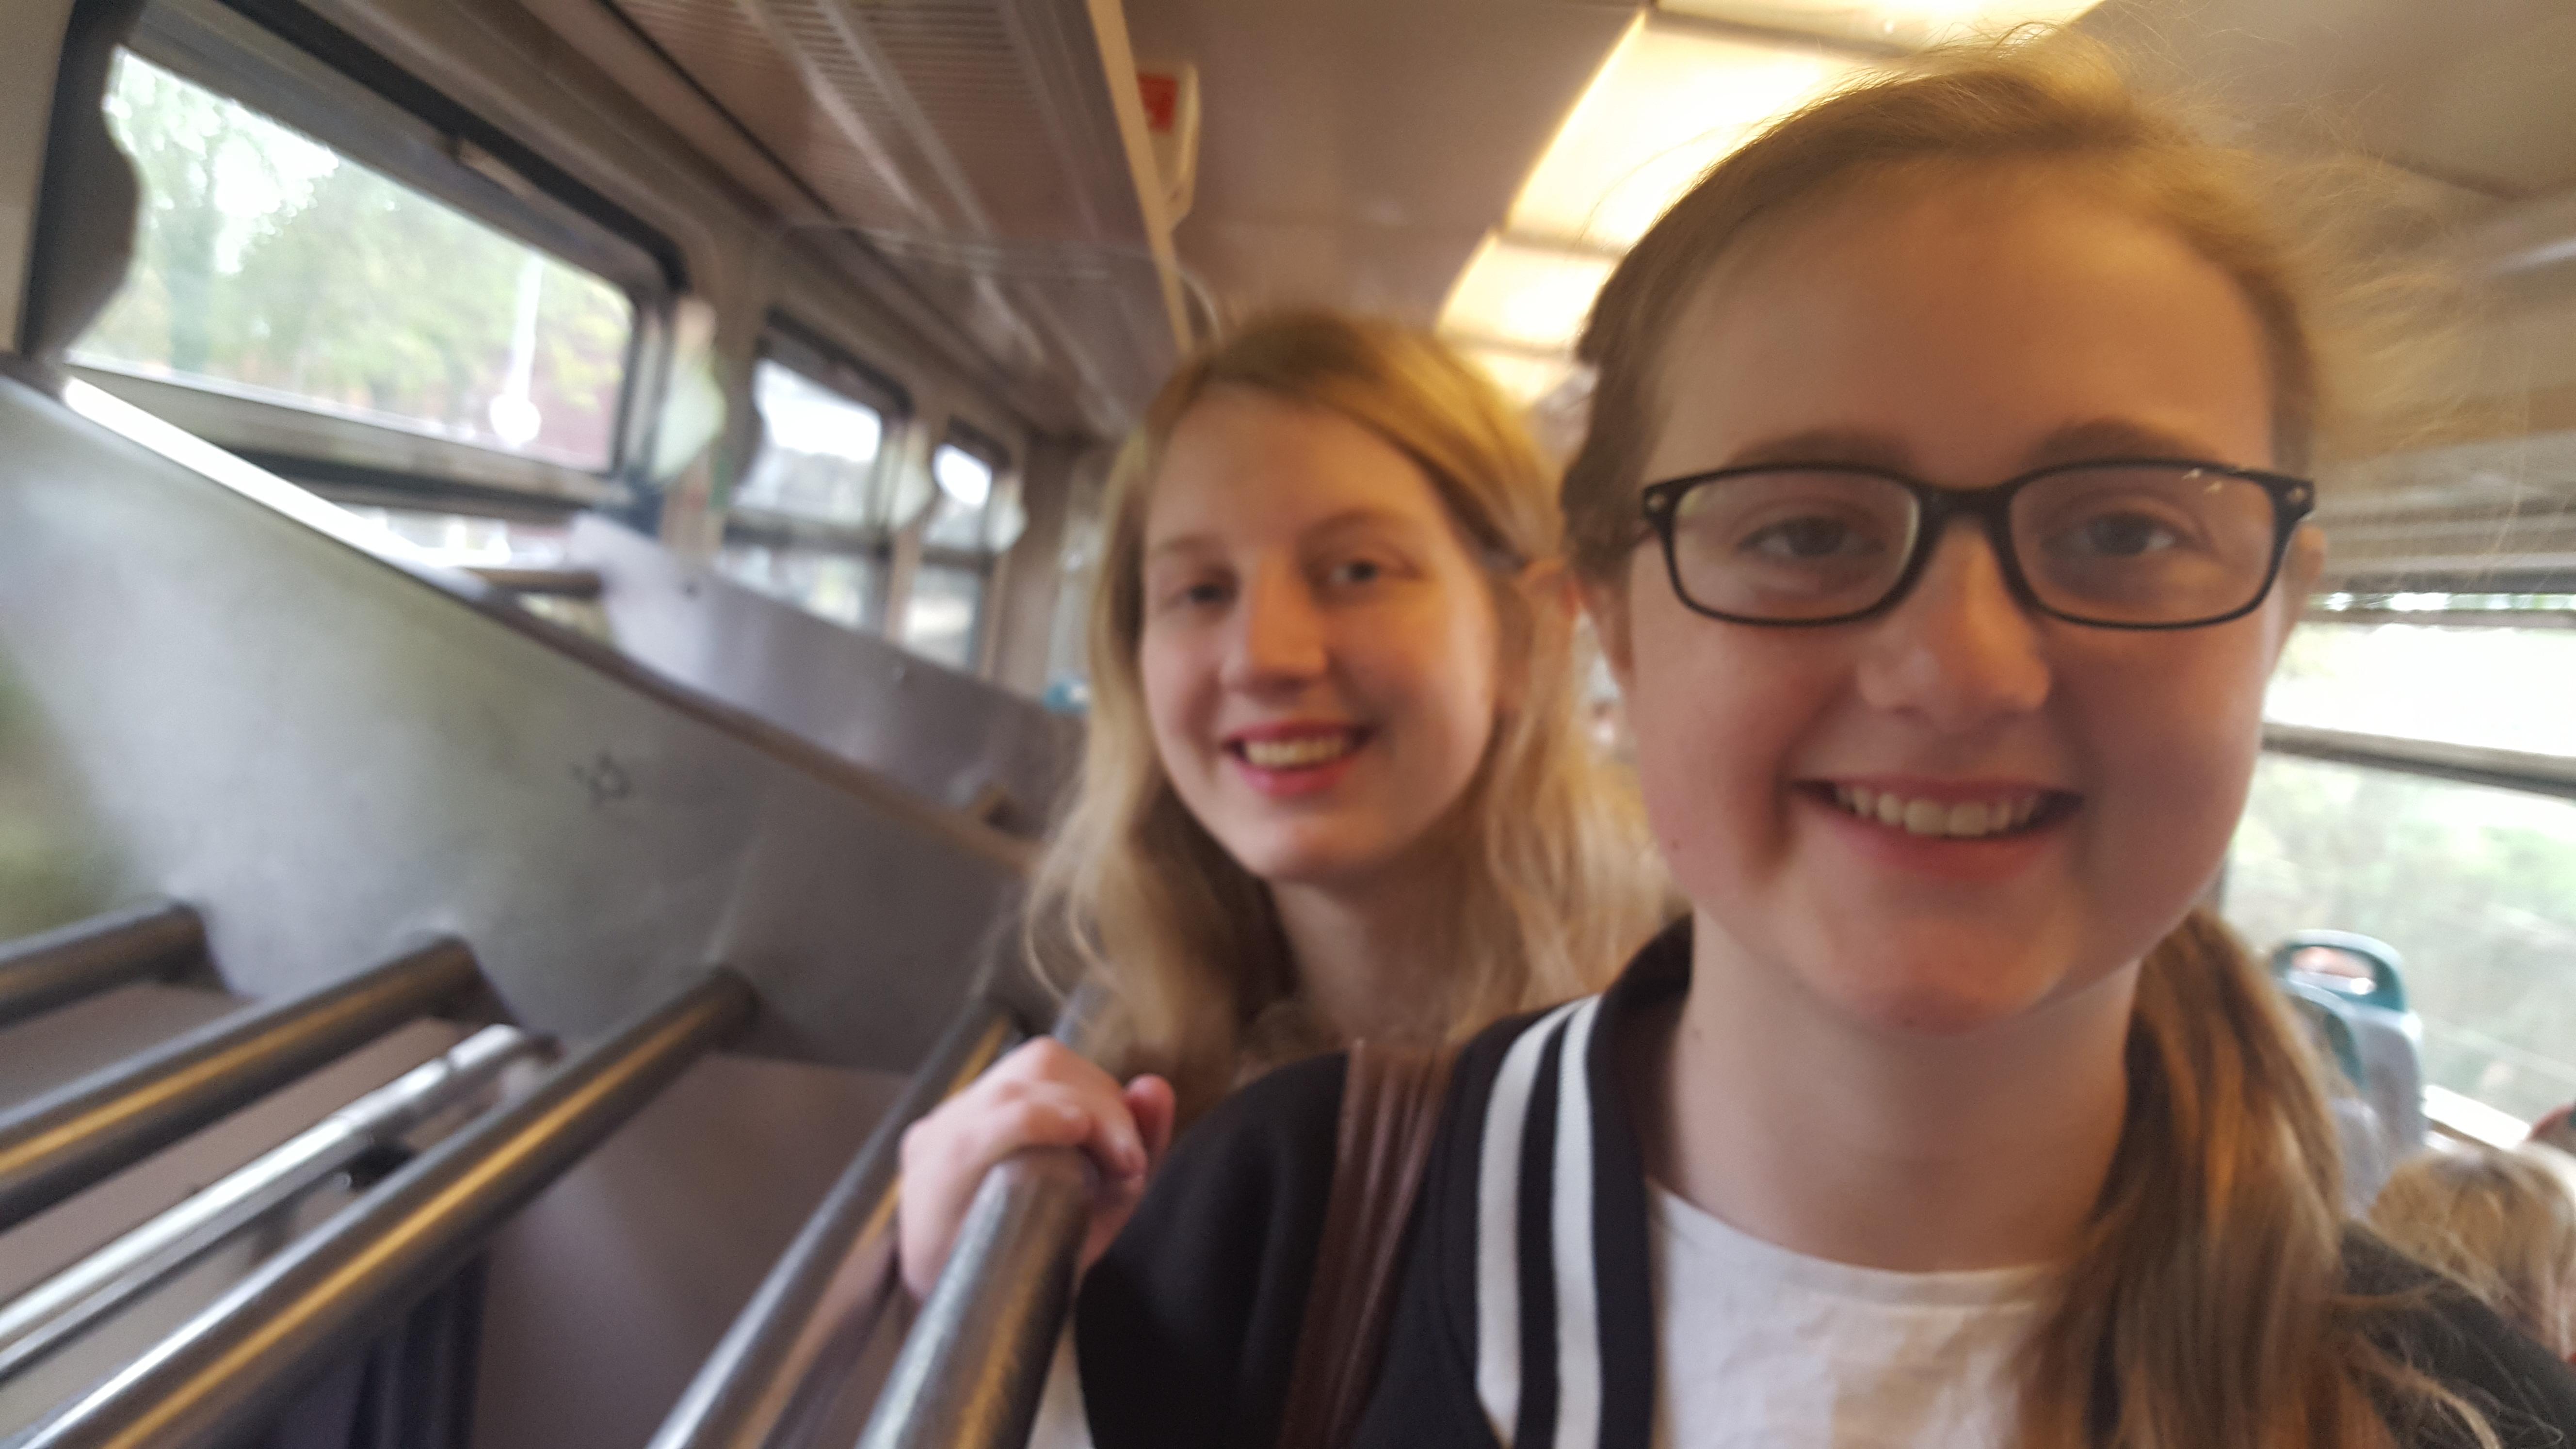 Xene and Neva on a Greater Anglia Train